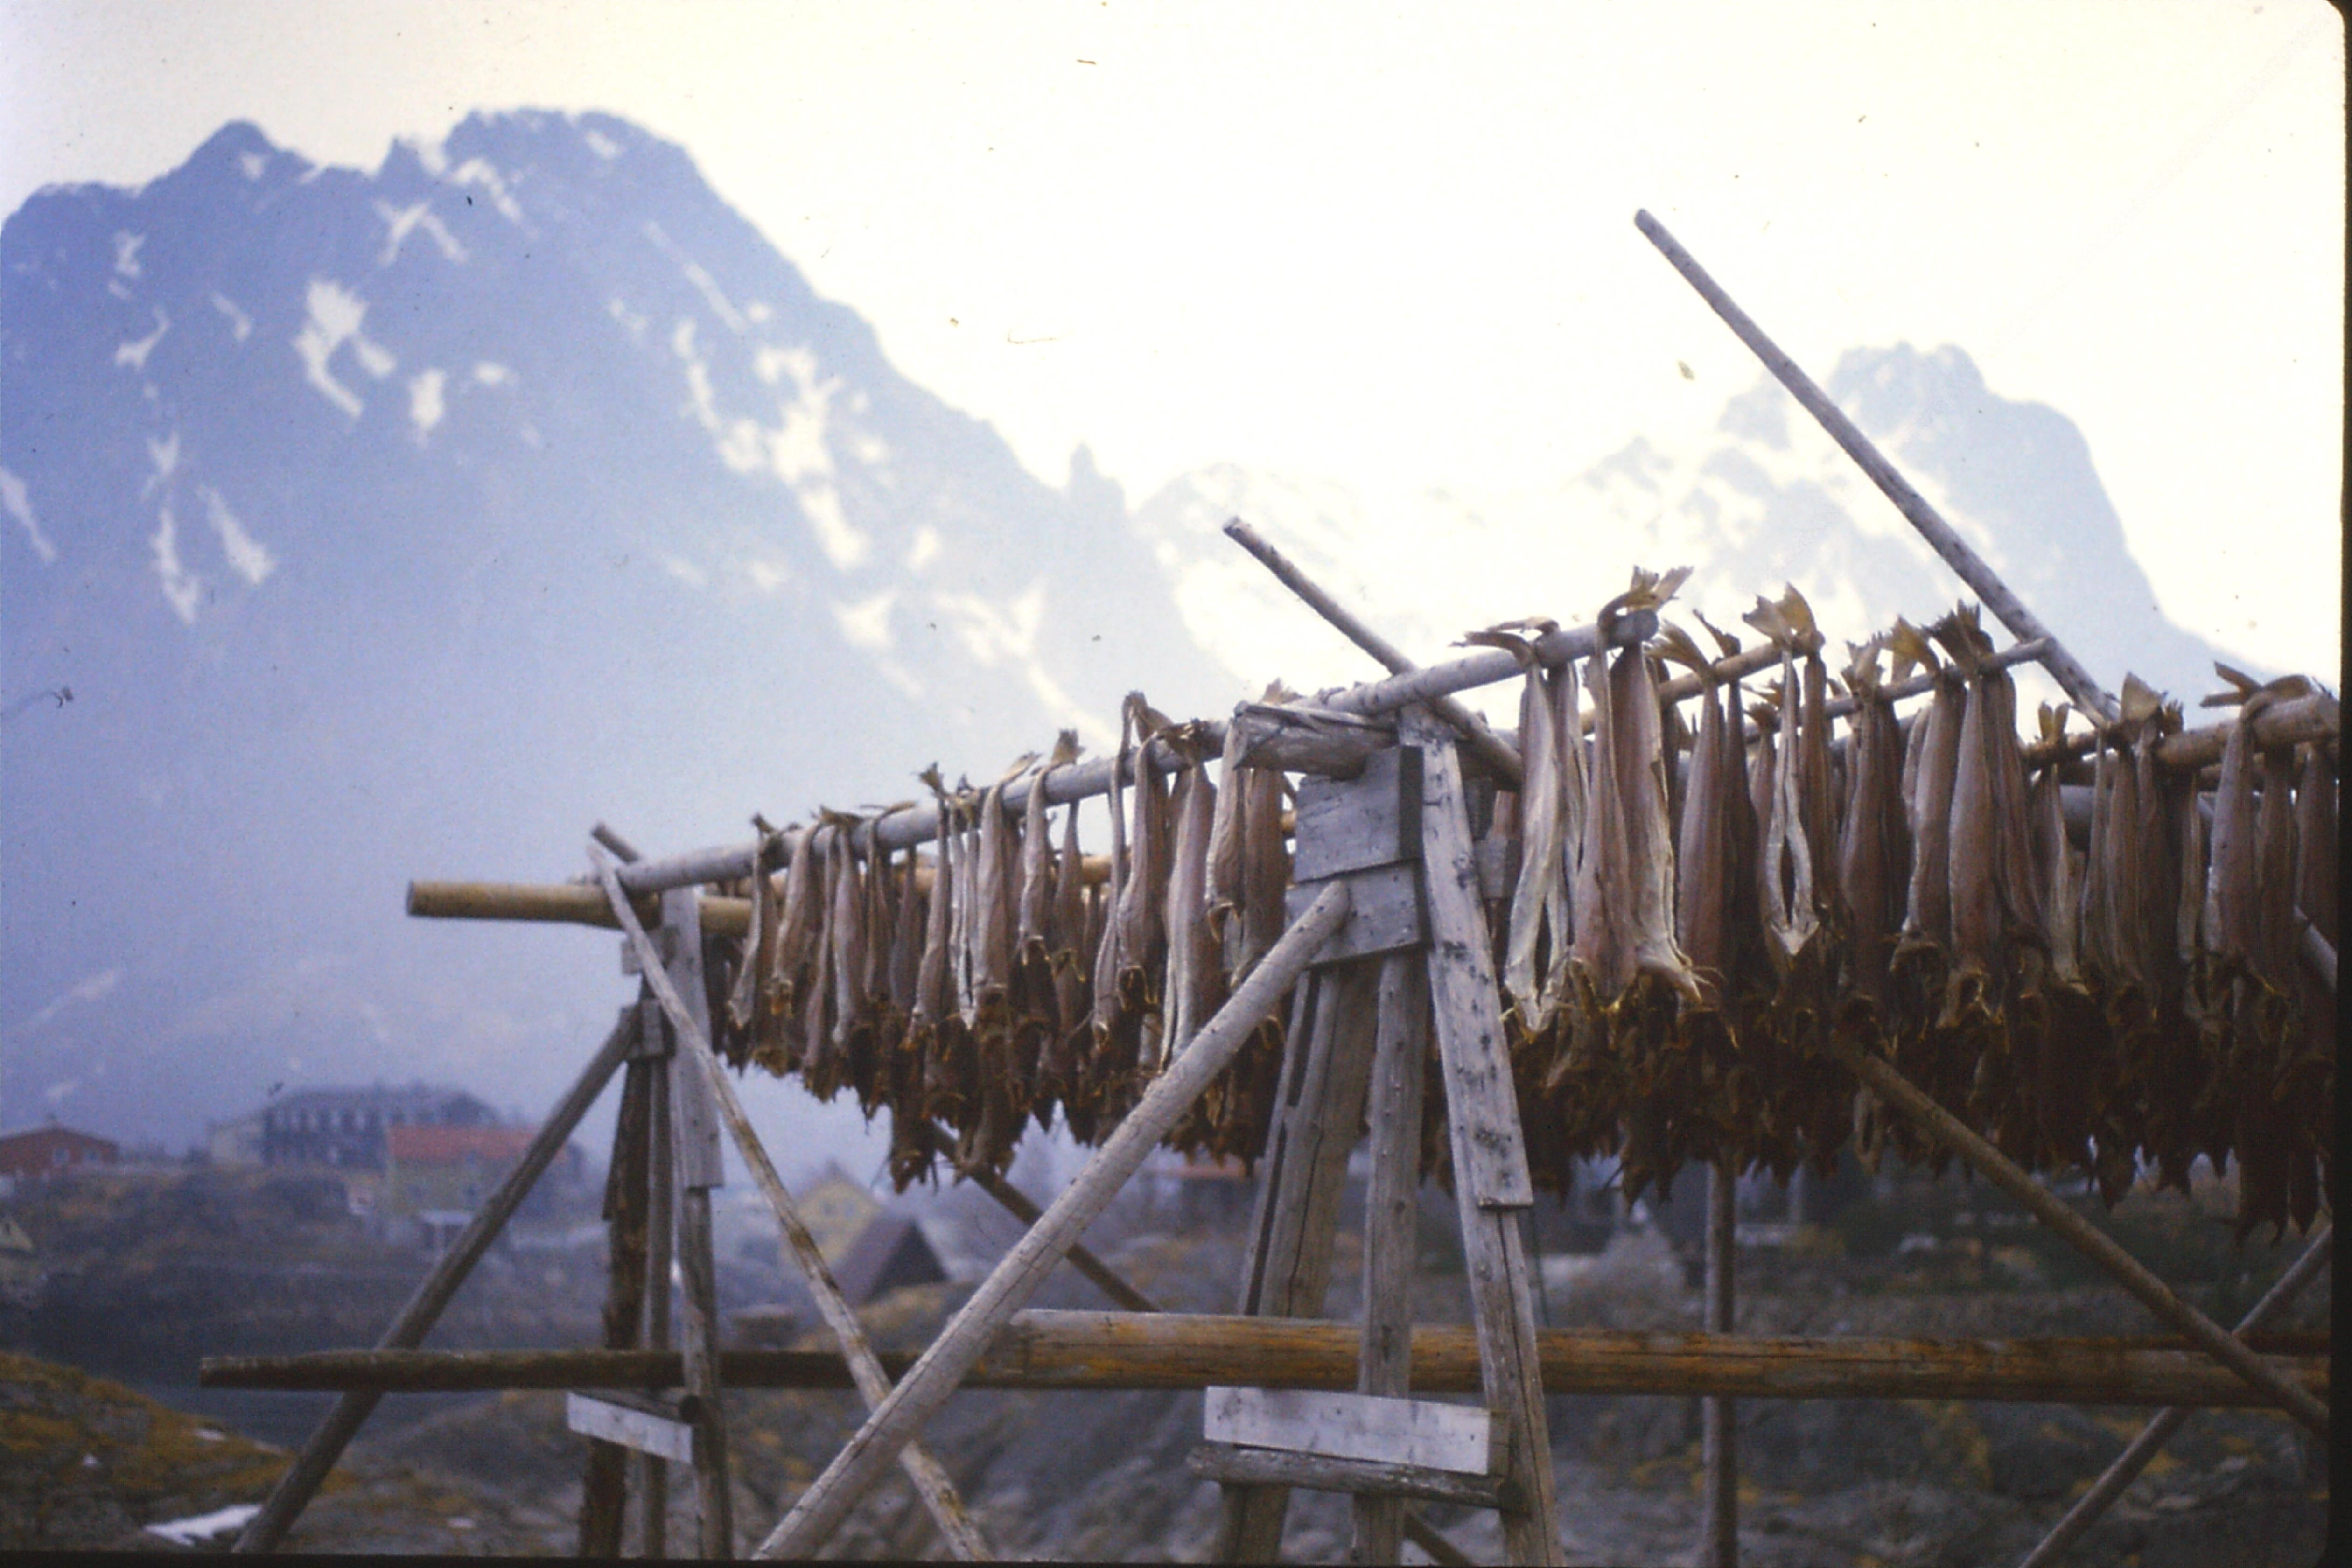 Cod drying, Lofoten